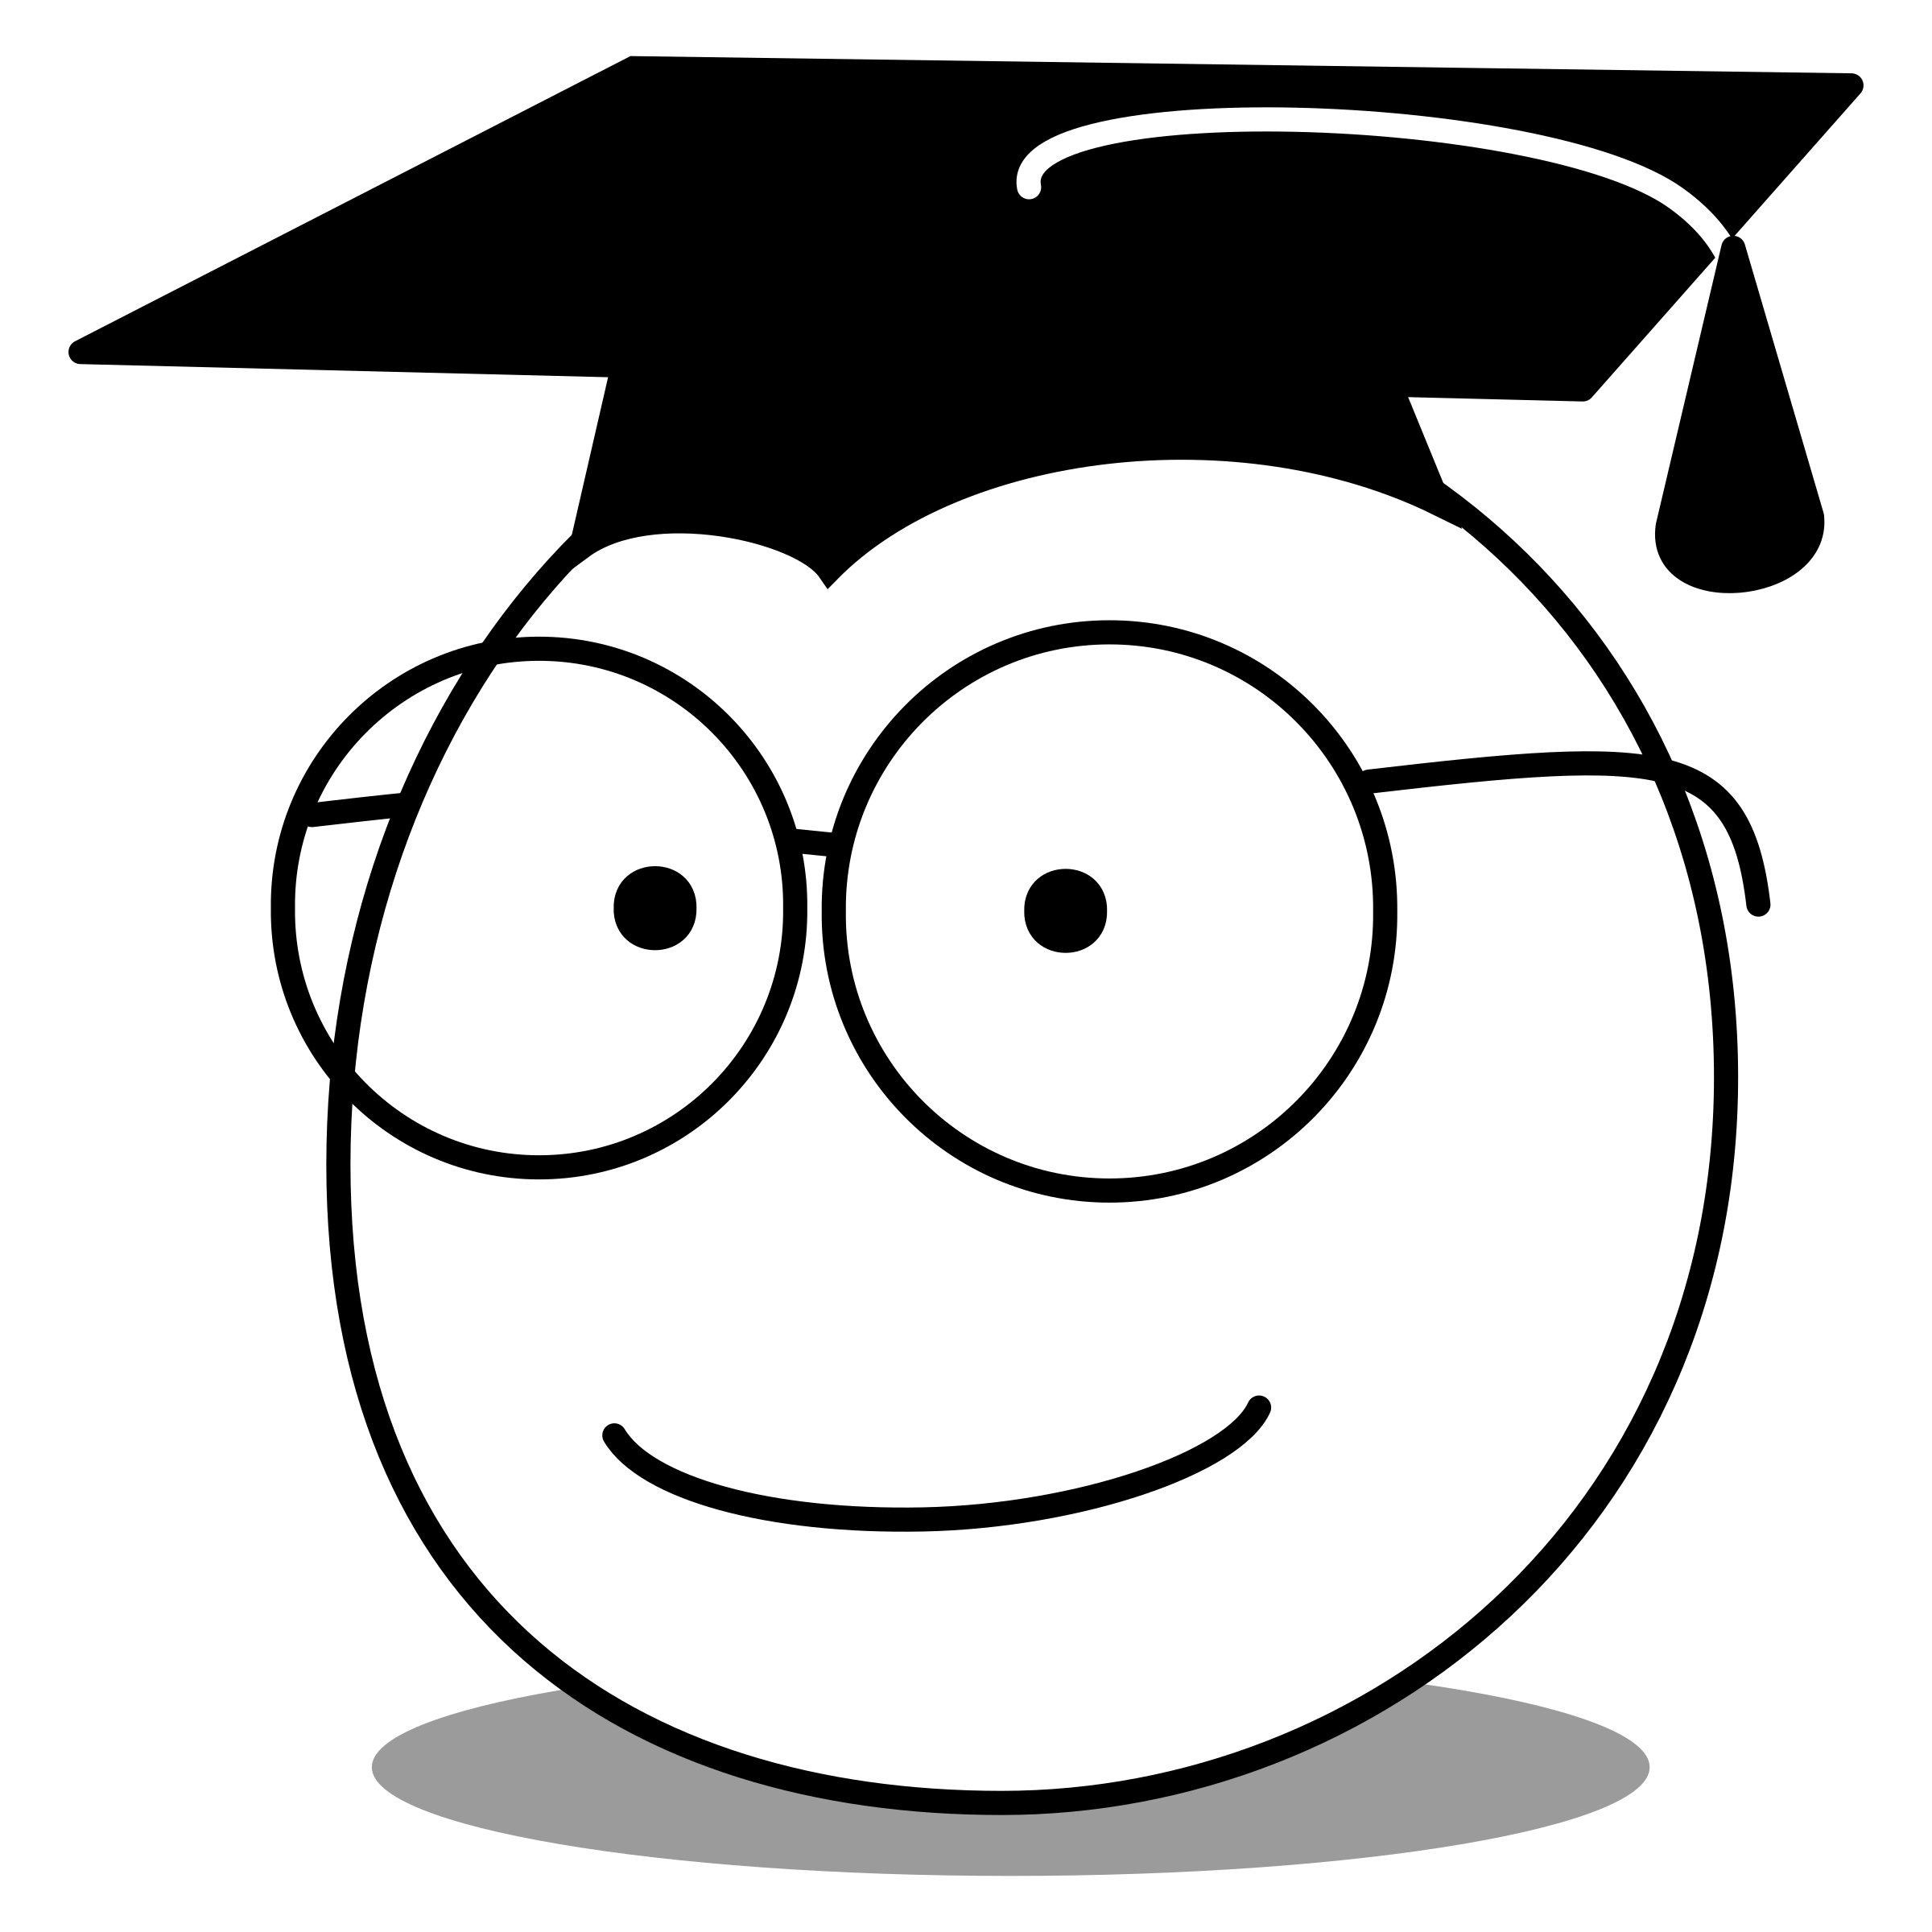 Graduate clipart logo. Buddy big image png